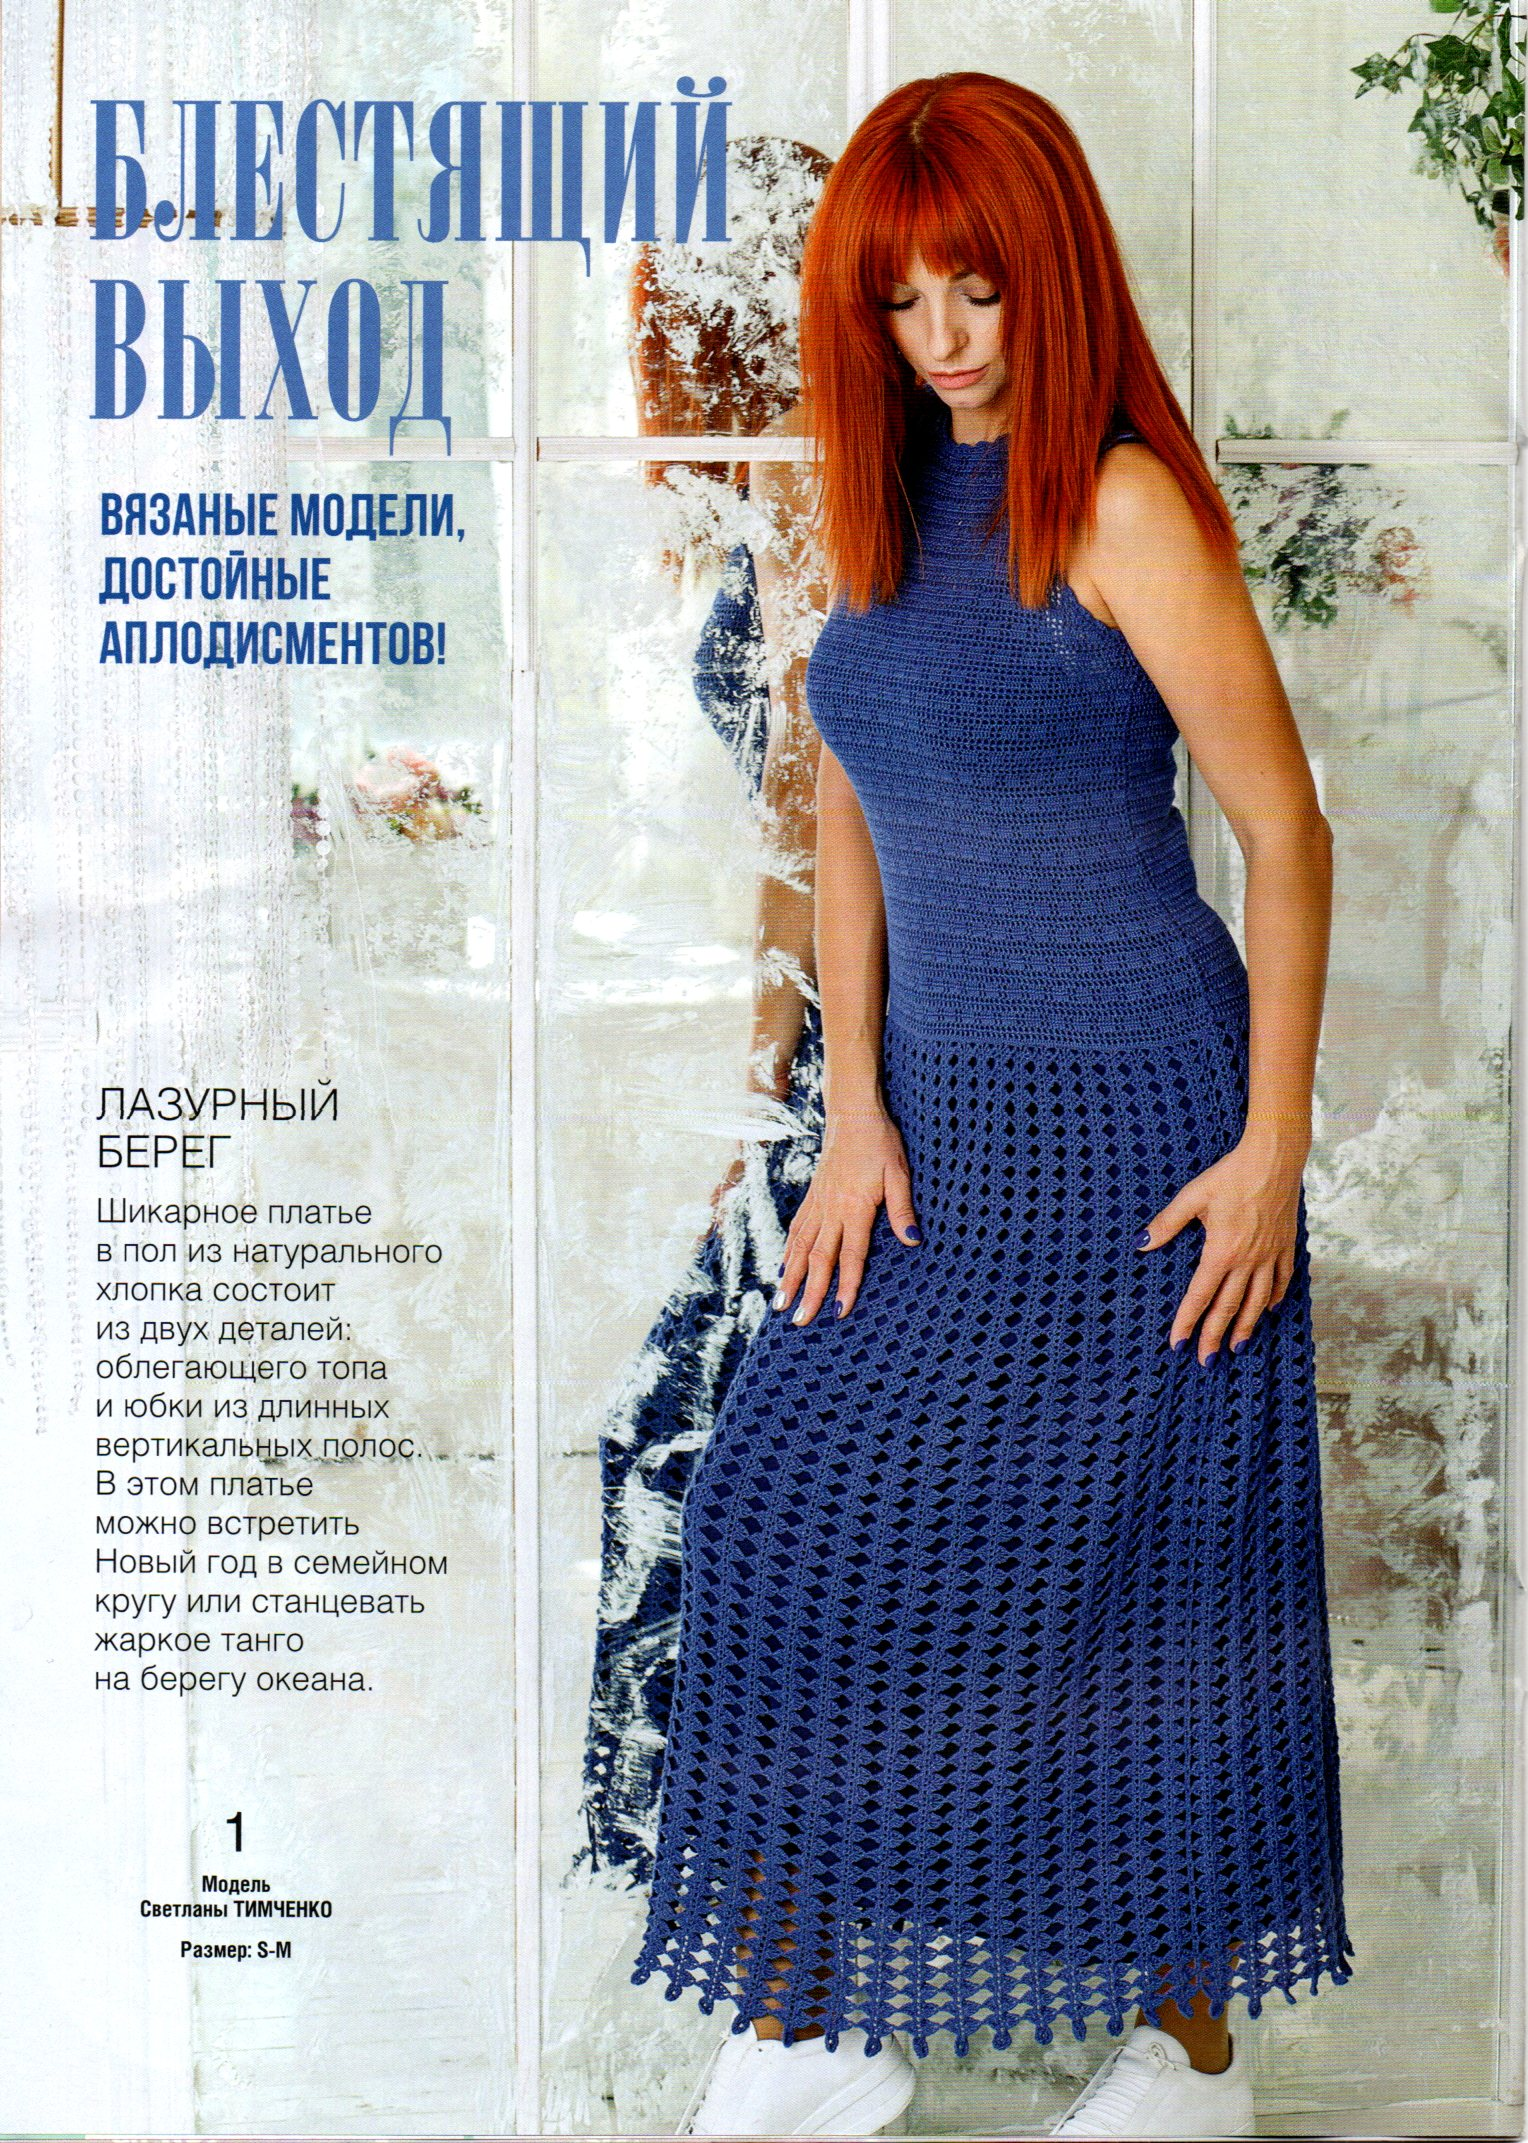 http://images.vfl.ru/ii/1610300281/6ddfc015/32910476.jpg